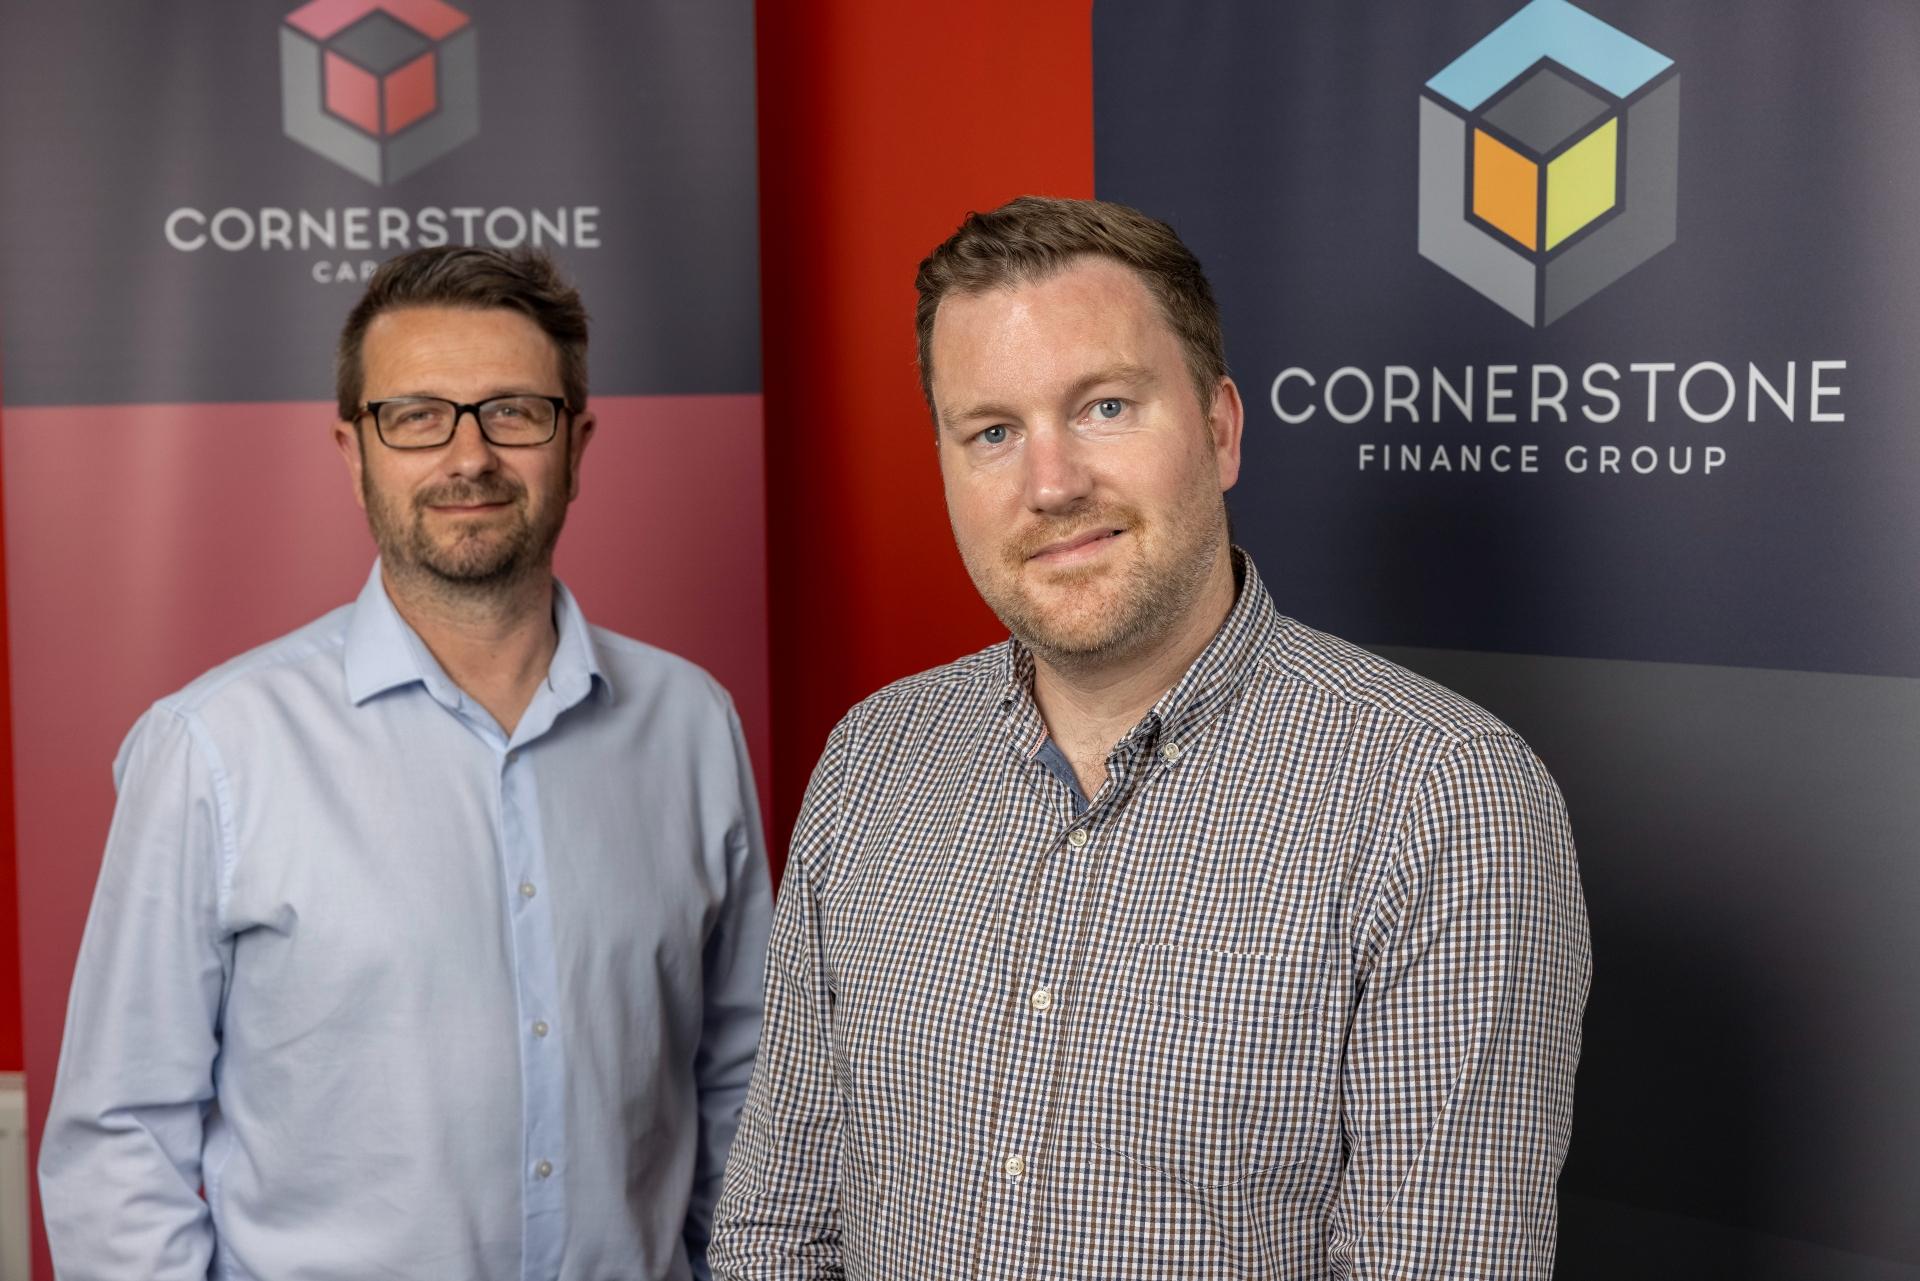 Cornerstone Commercial Insurance anahtar kiralama getiriyor